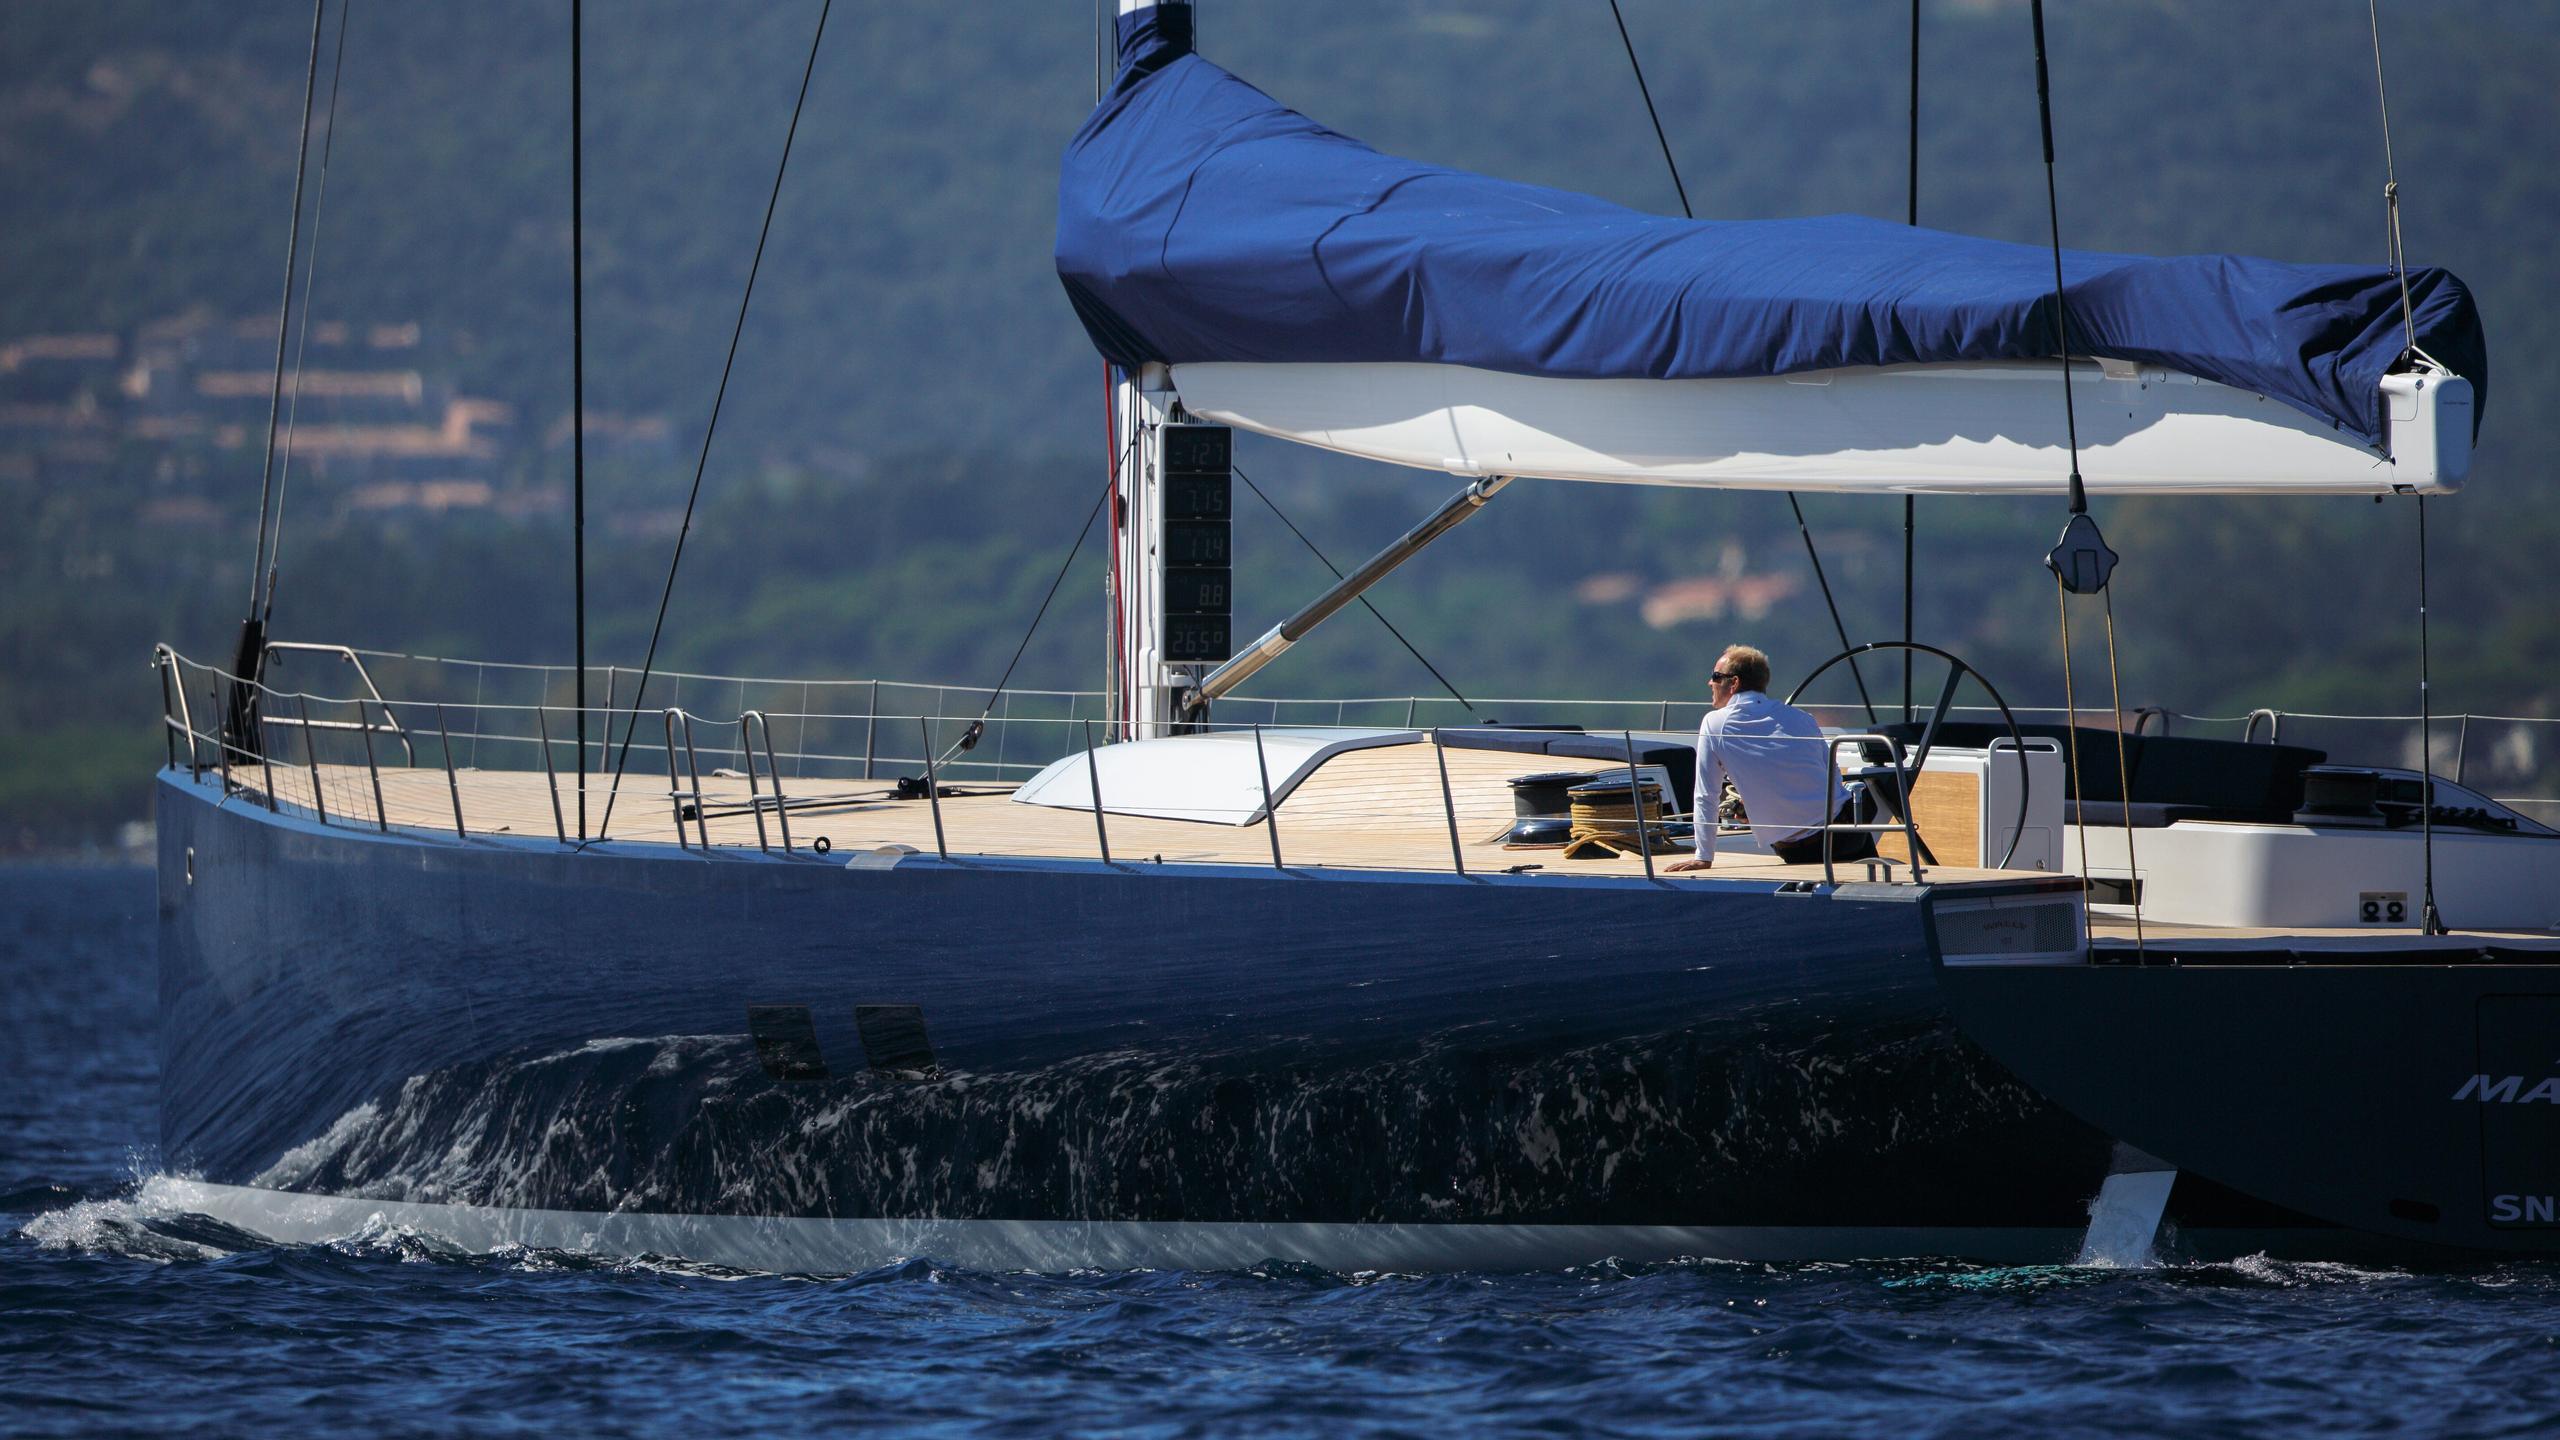 Magic-Carpet-iii-sailing-yacht-wally-21013-30m-running